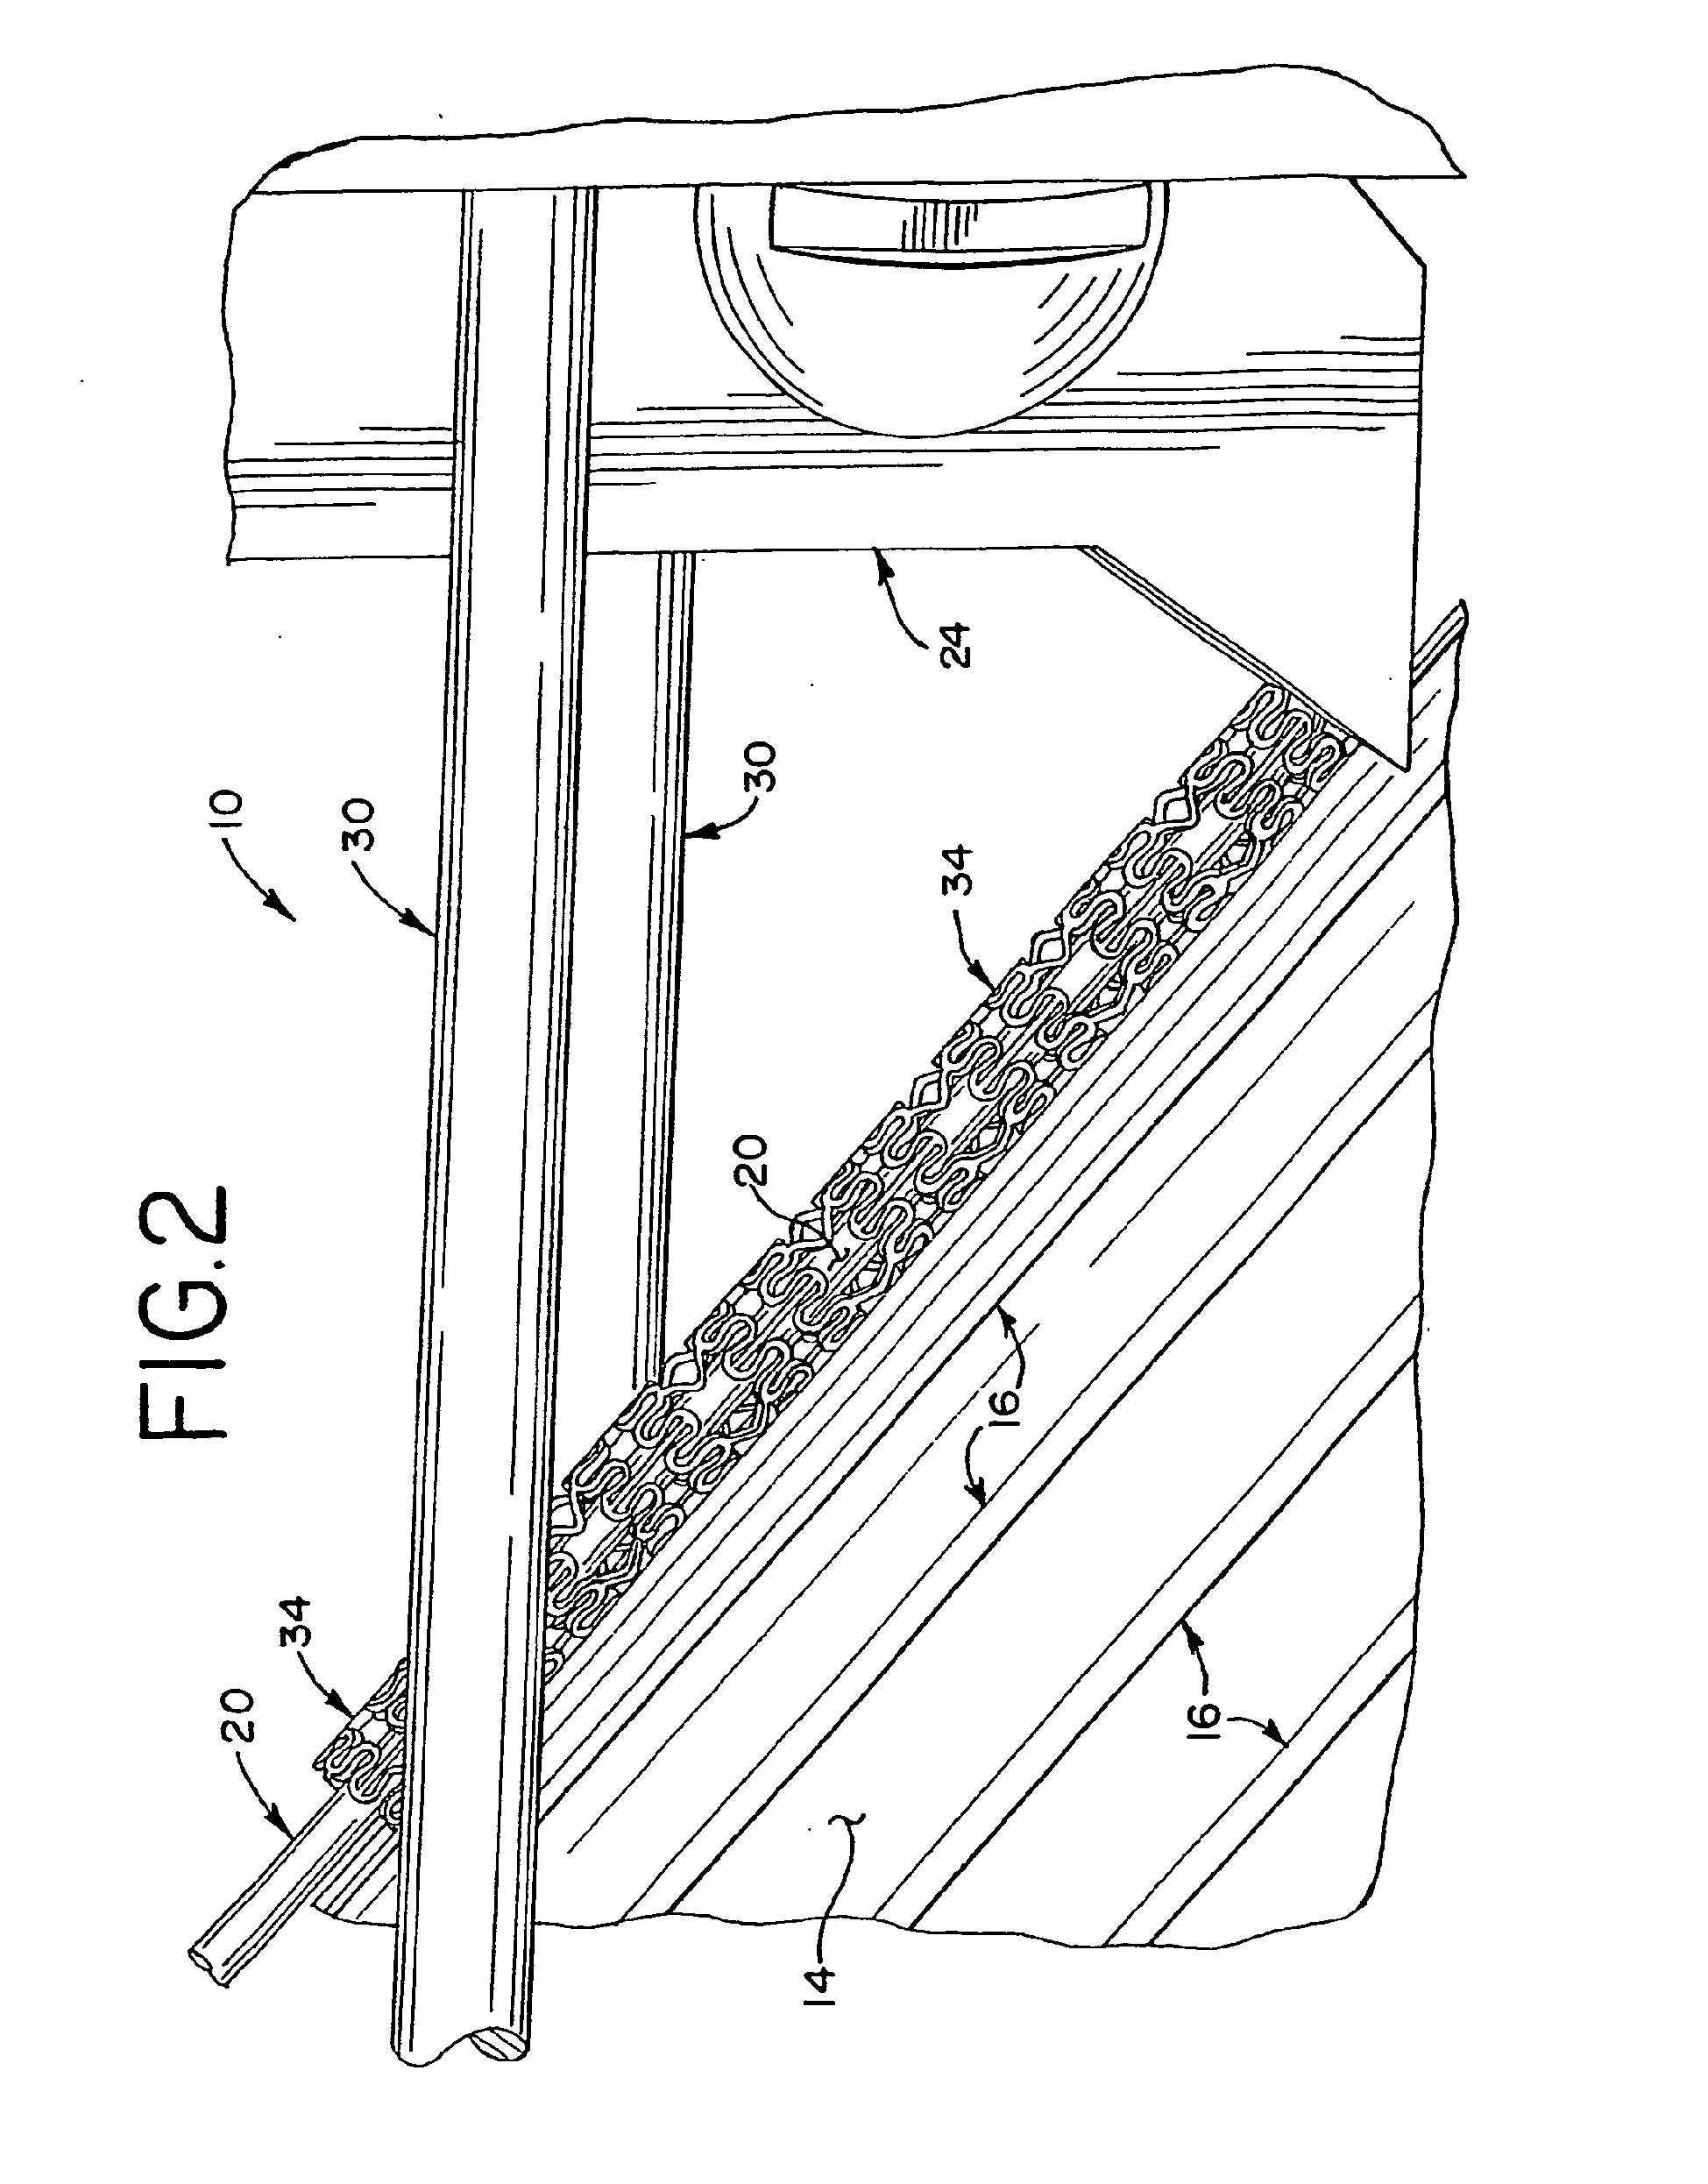 Patent Ep1697564b1 Electropolishing Apparatus And Method